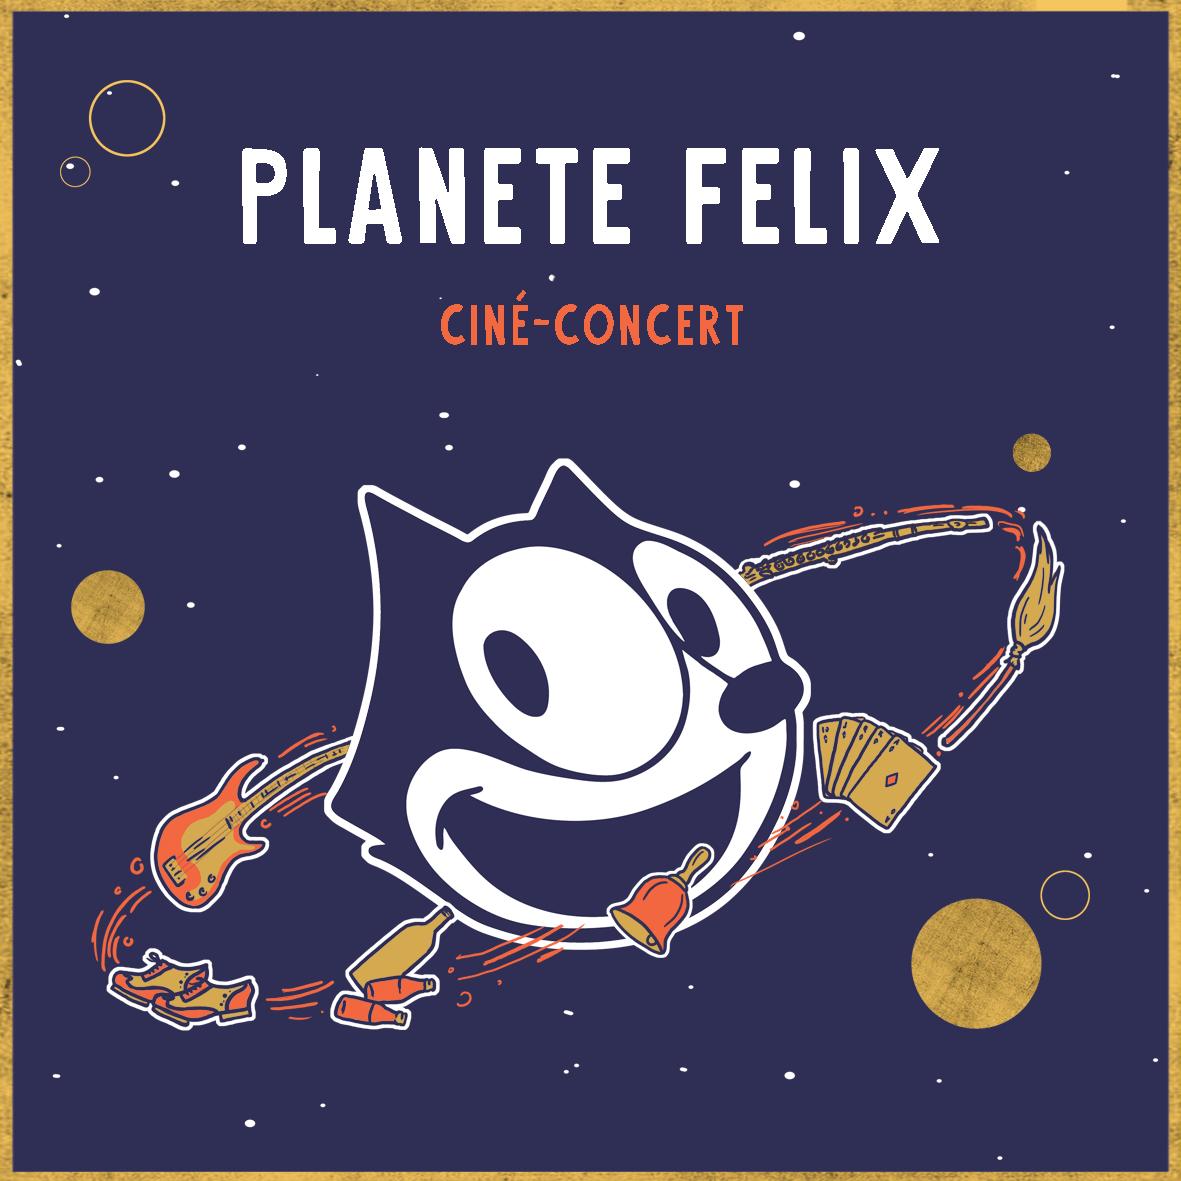 PLANETE FELIX